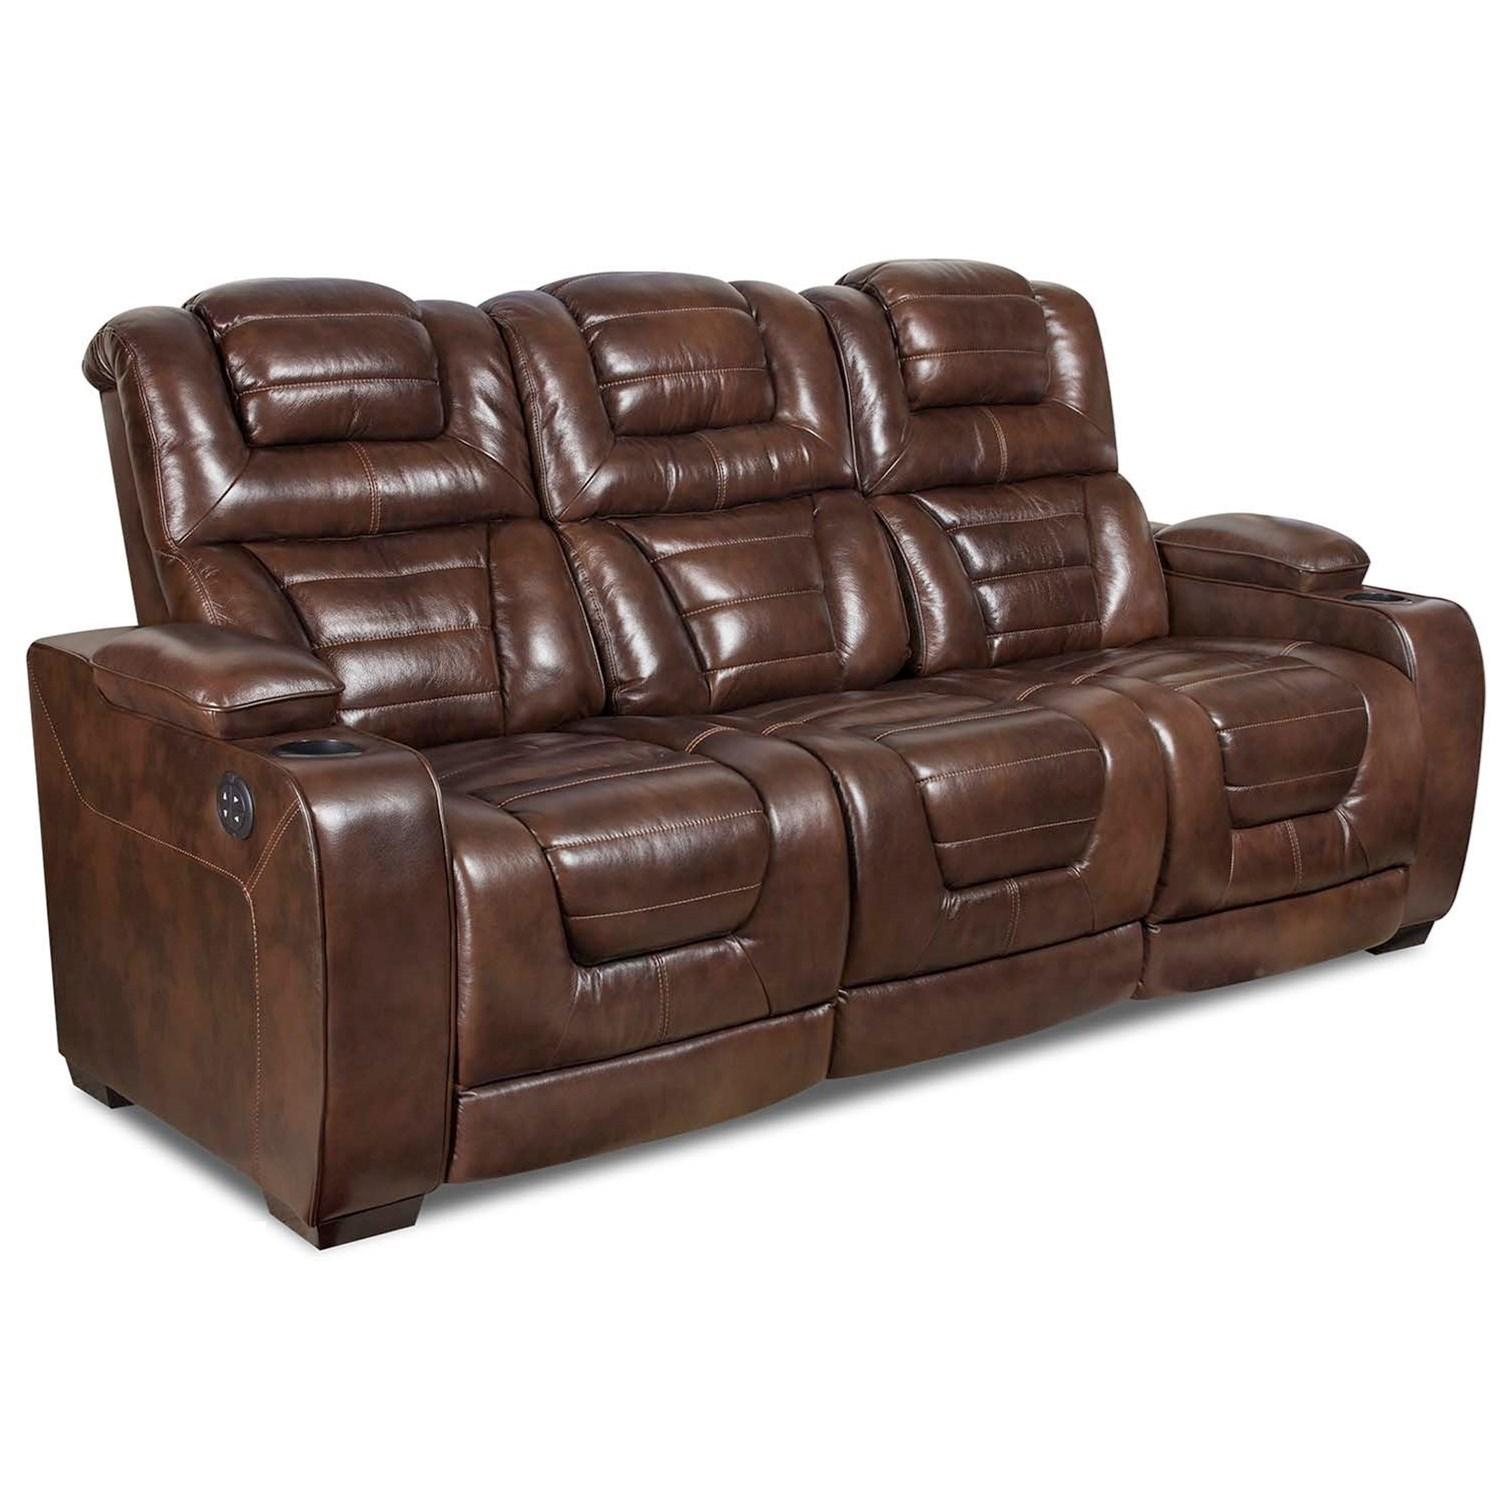 Corinthian 73901 Power Headrest Recline Sofa - Item Number: 73904-39HR